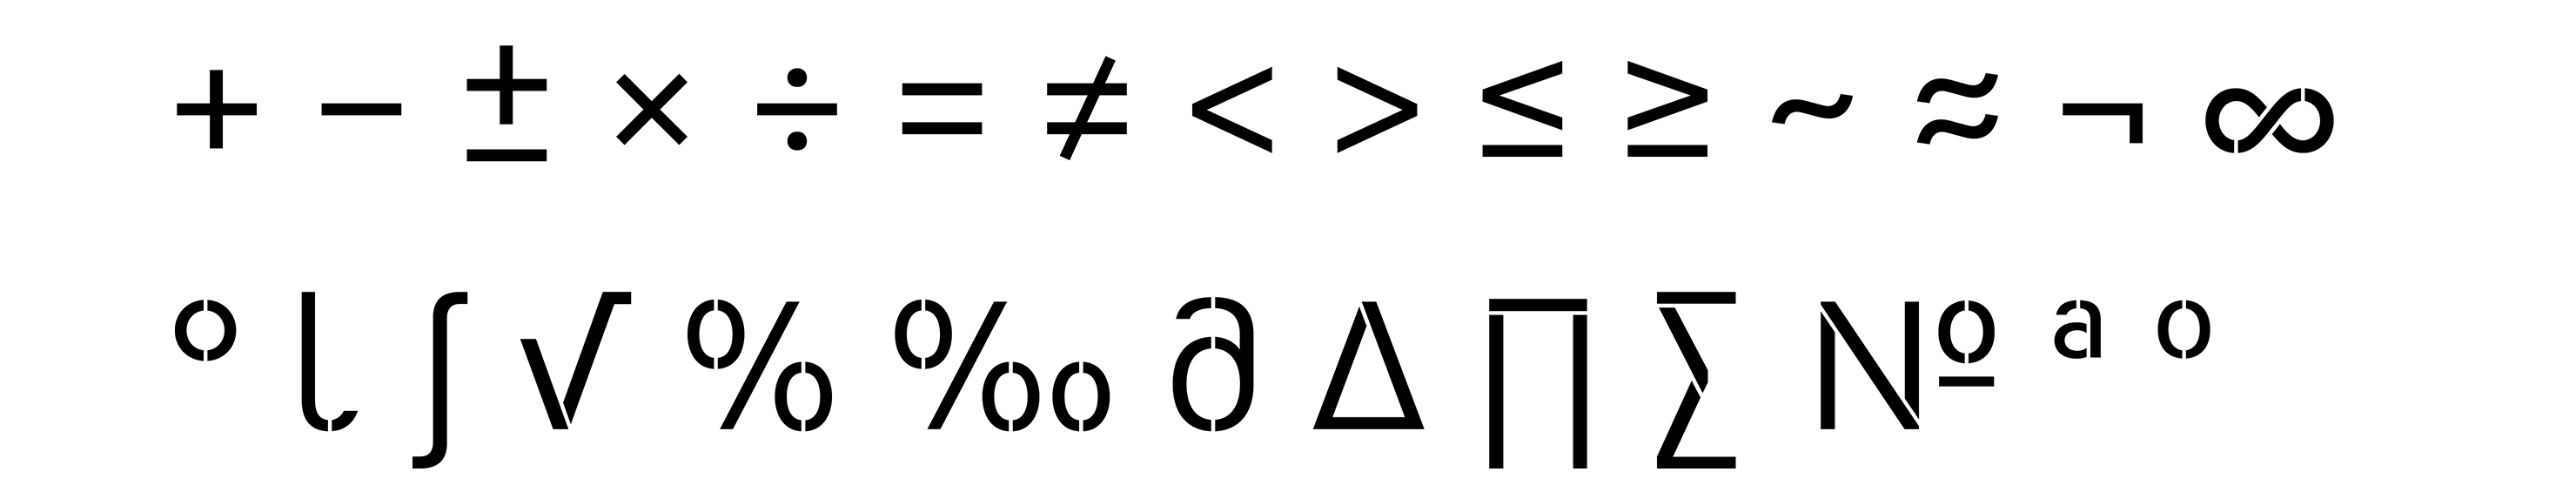 Typeface-Heimat-Stencil-F15-Atlas-Font-Foundry